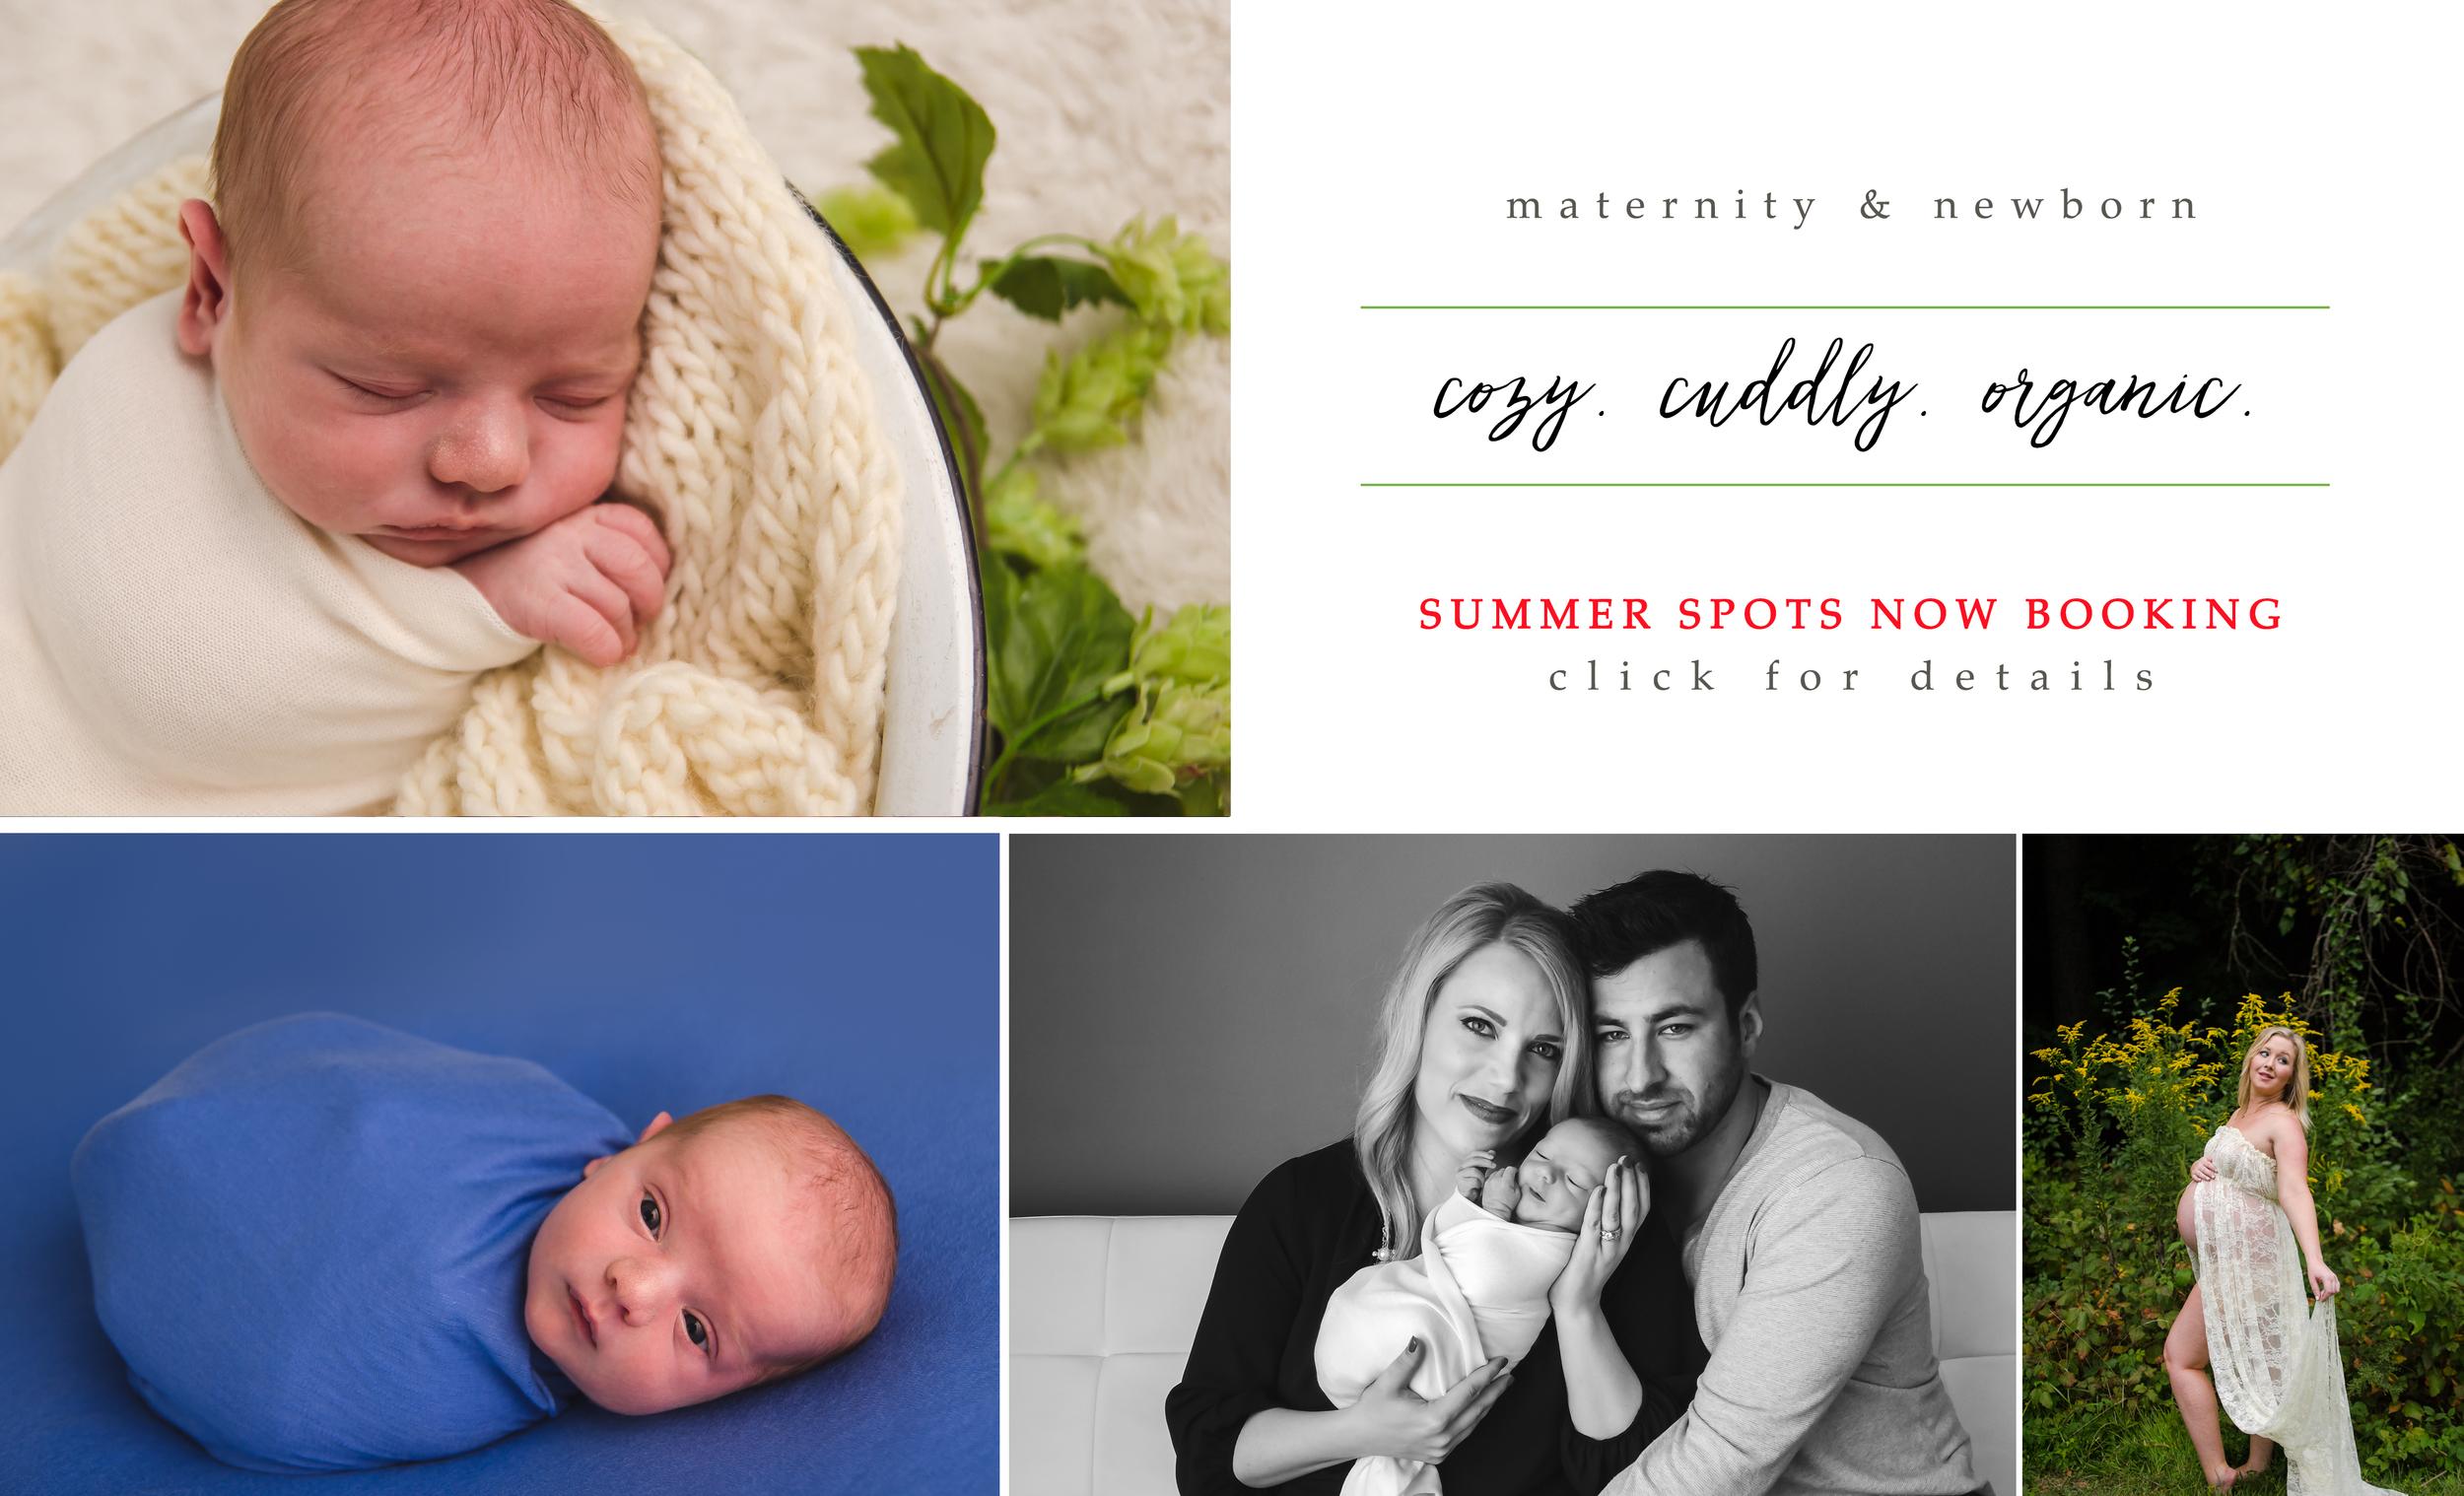 maternity and newborn footer.jpg